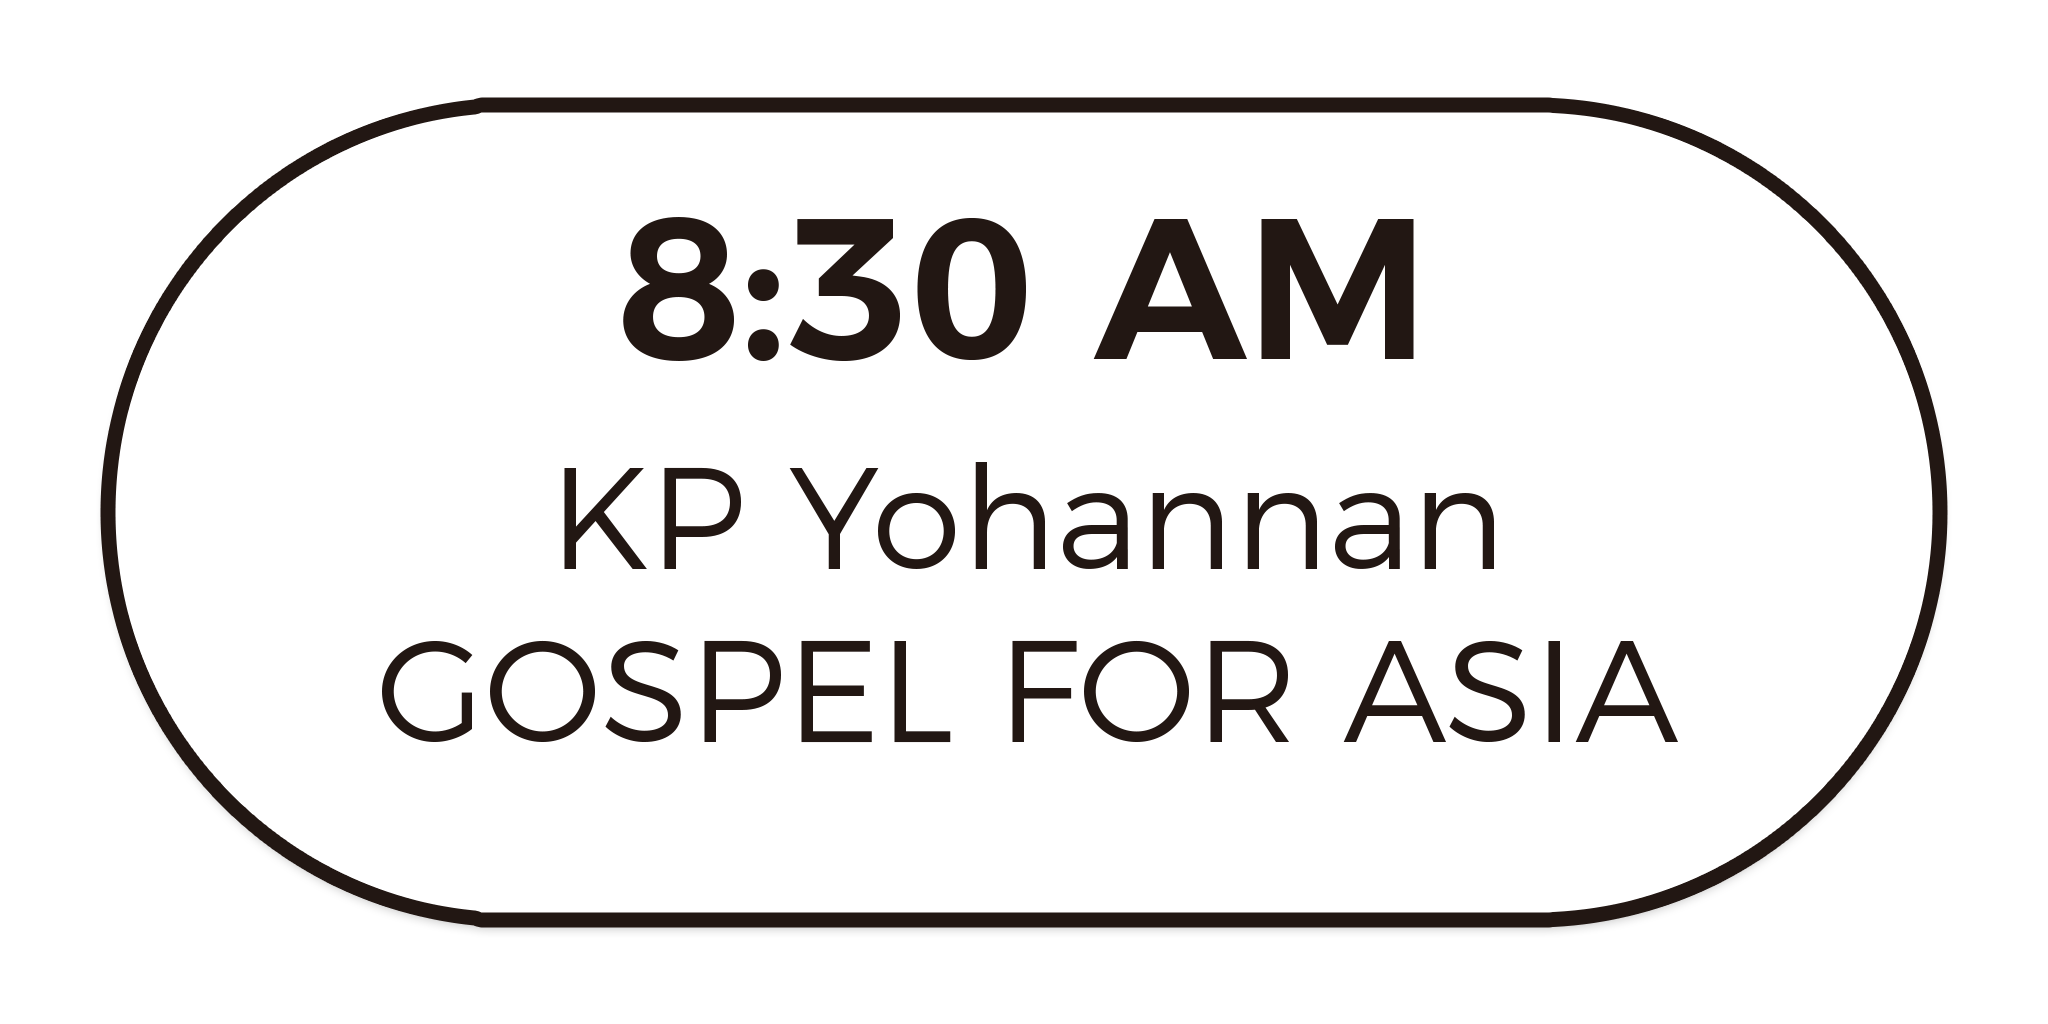 0830 SAT kp yohannan.png